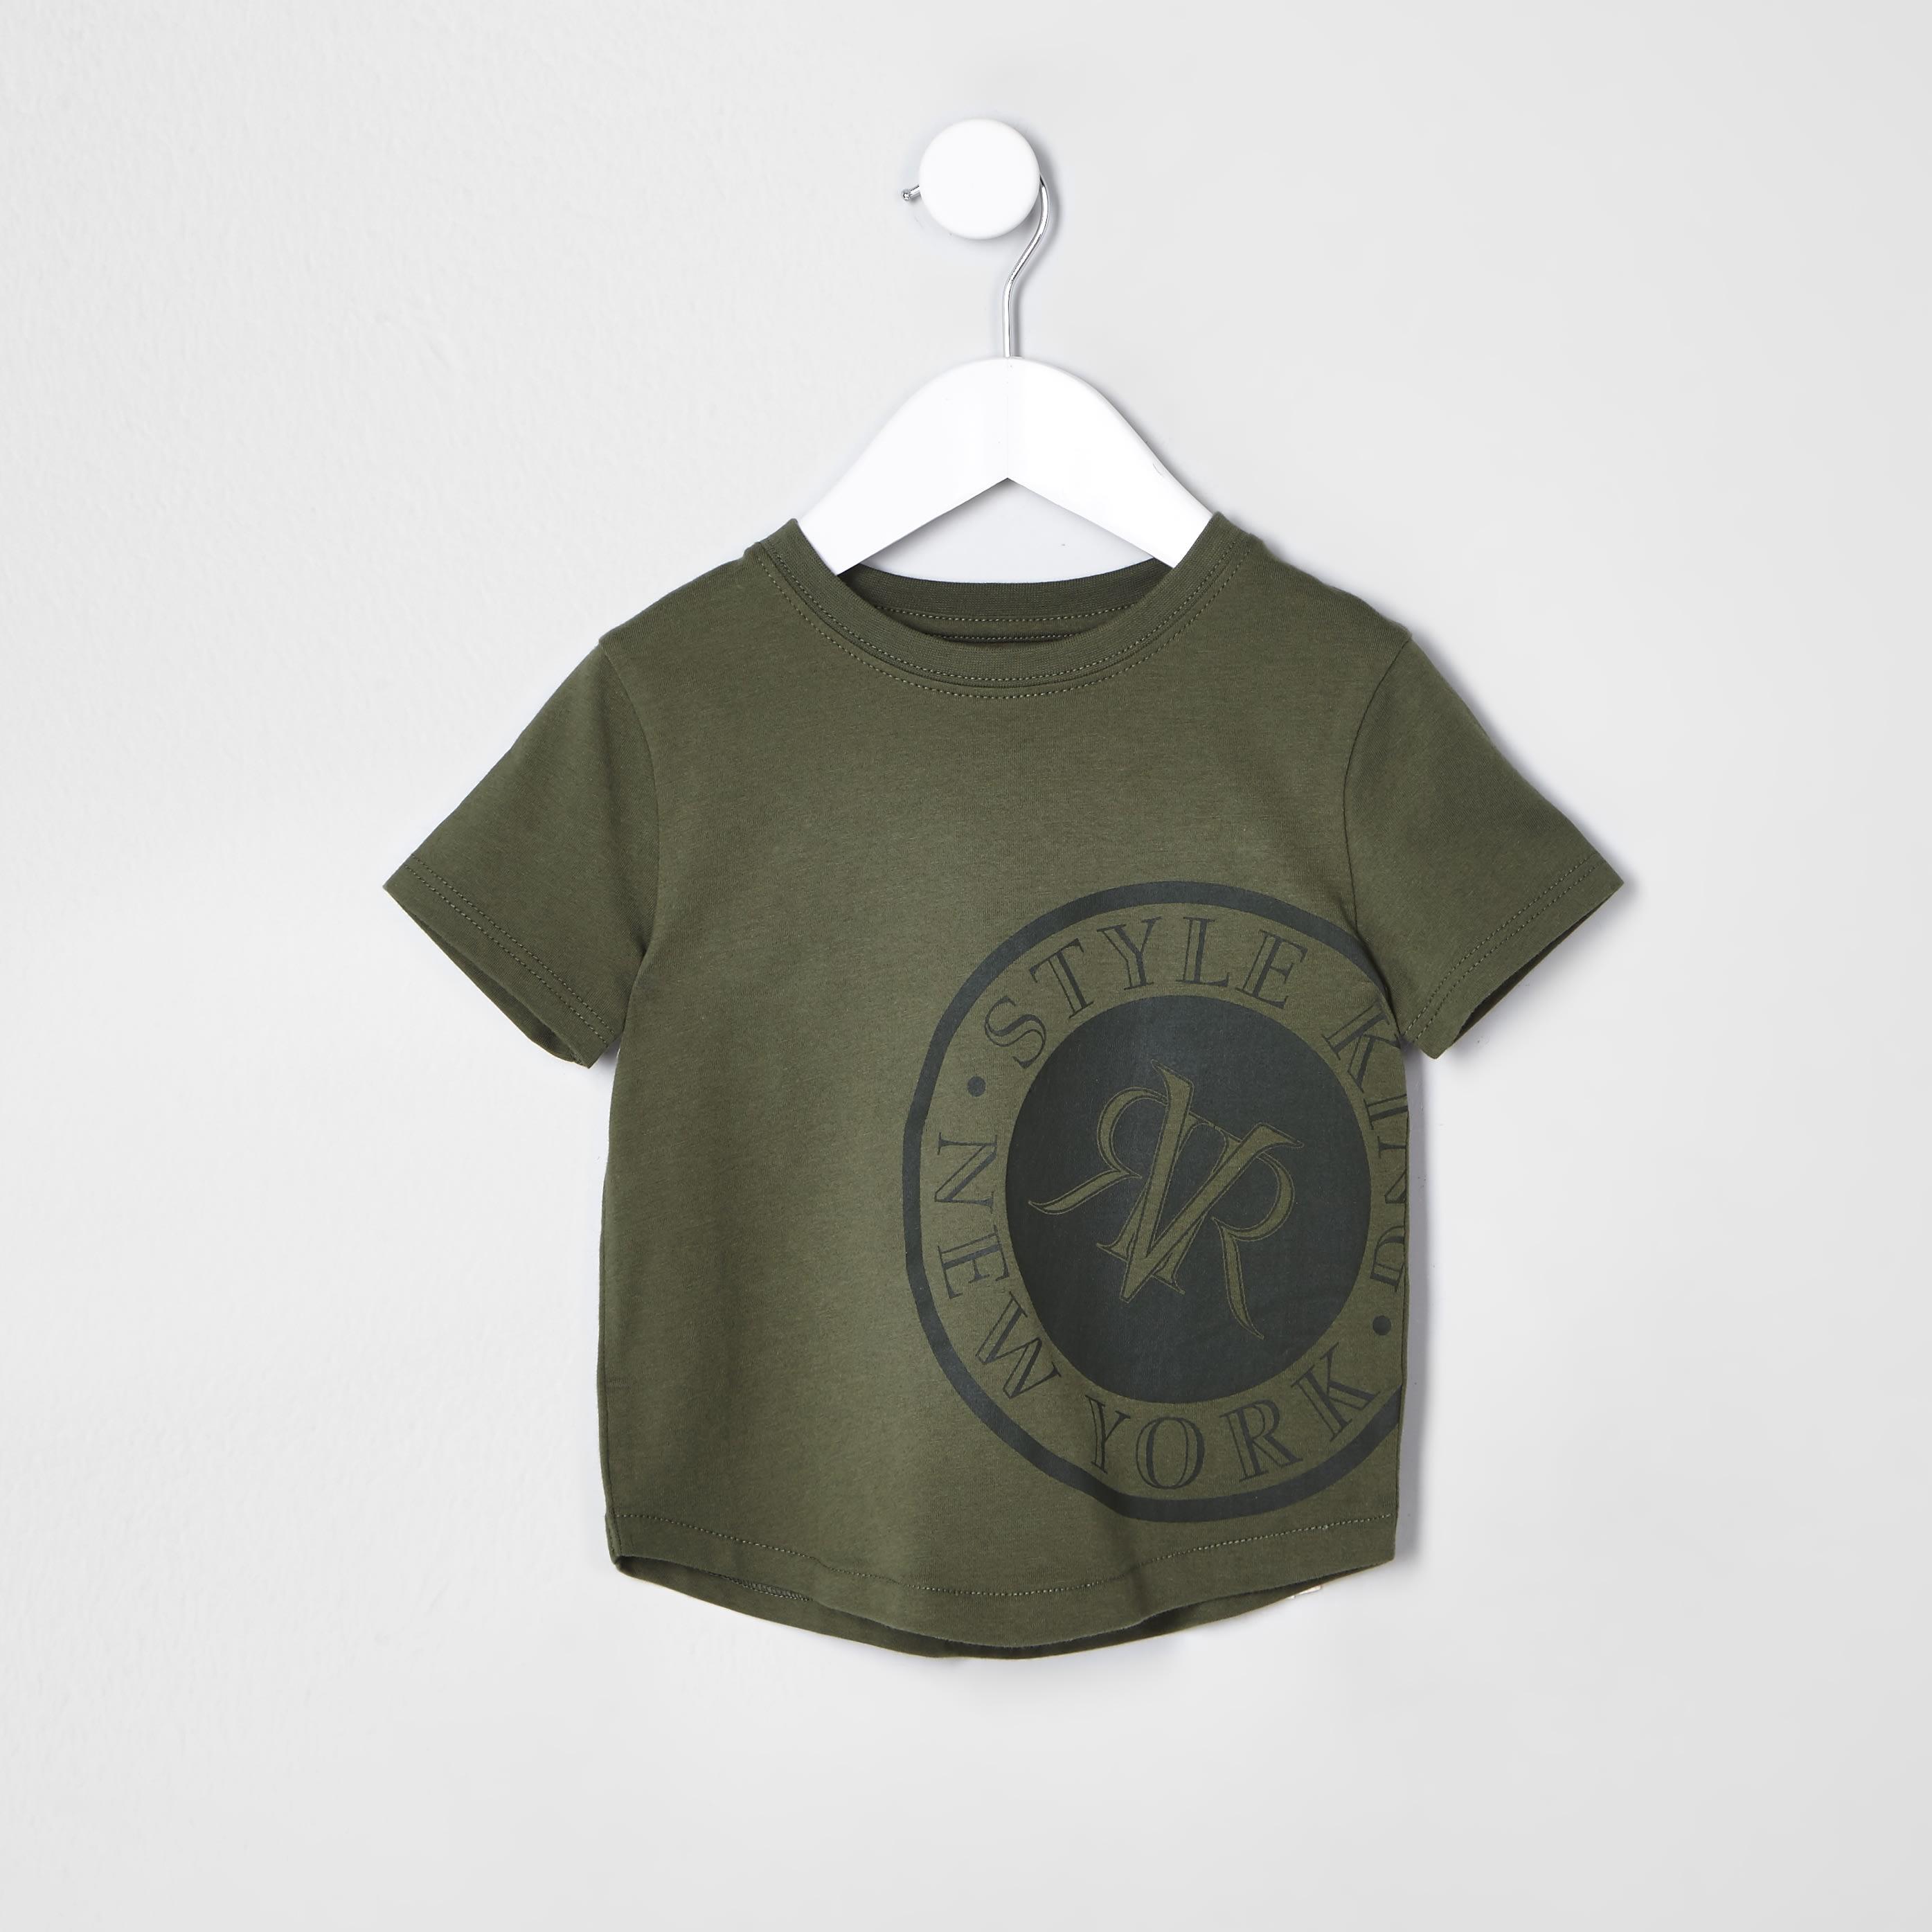 River Island Baby Boys Khaki 'New York' T-shirt (0-3 Mths)